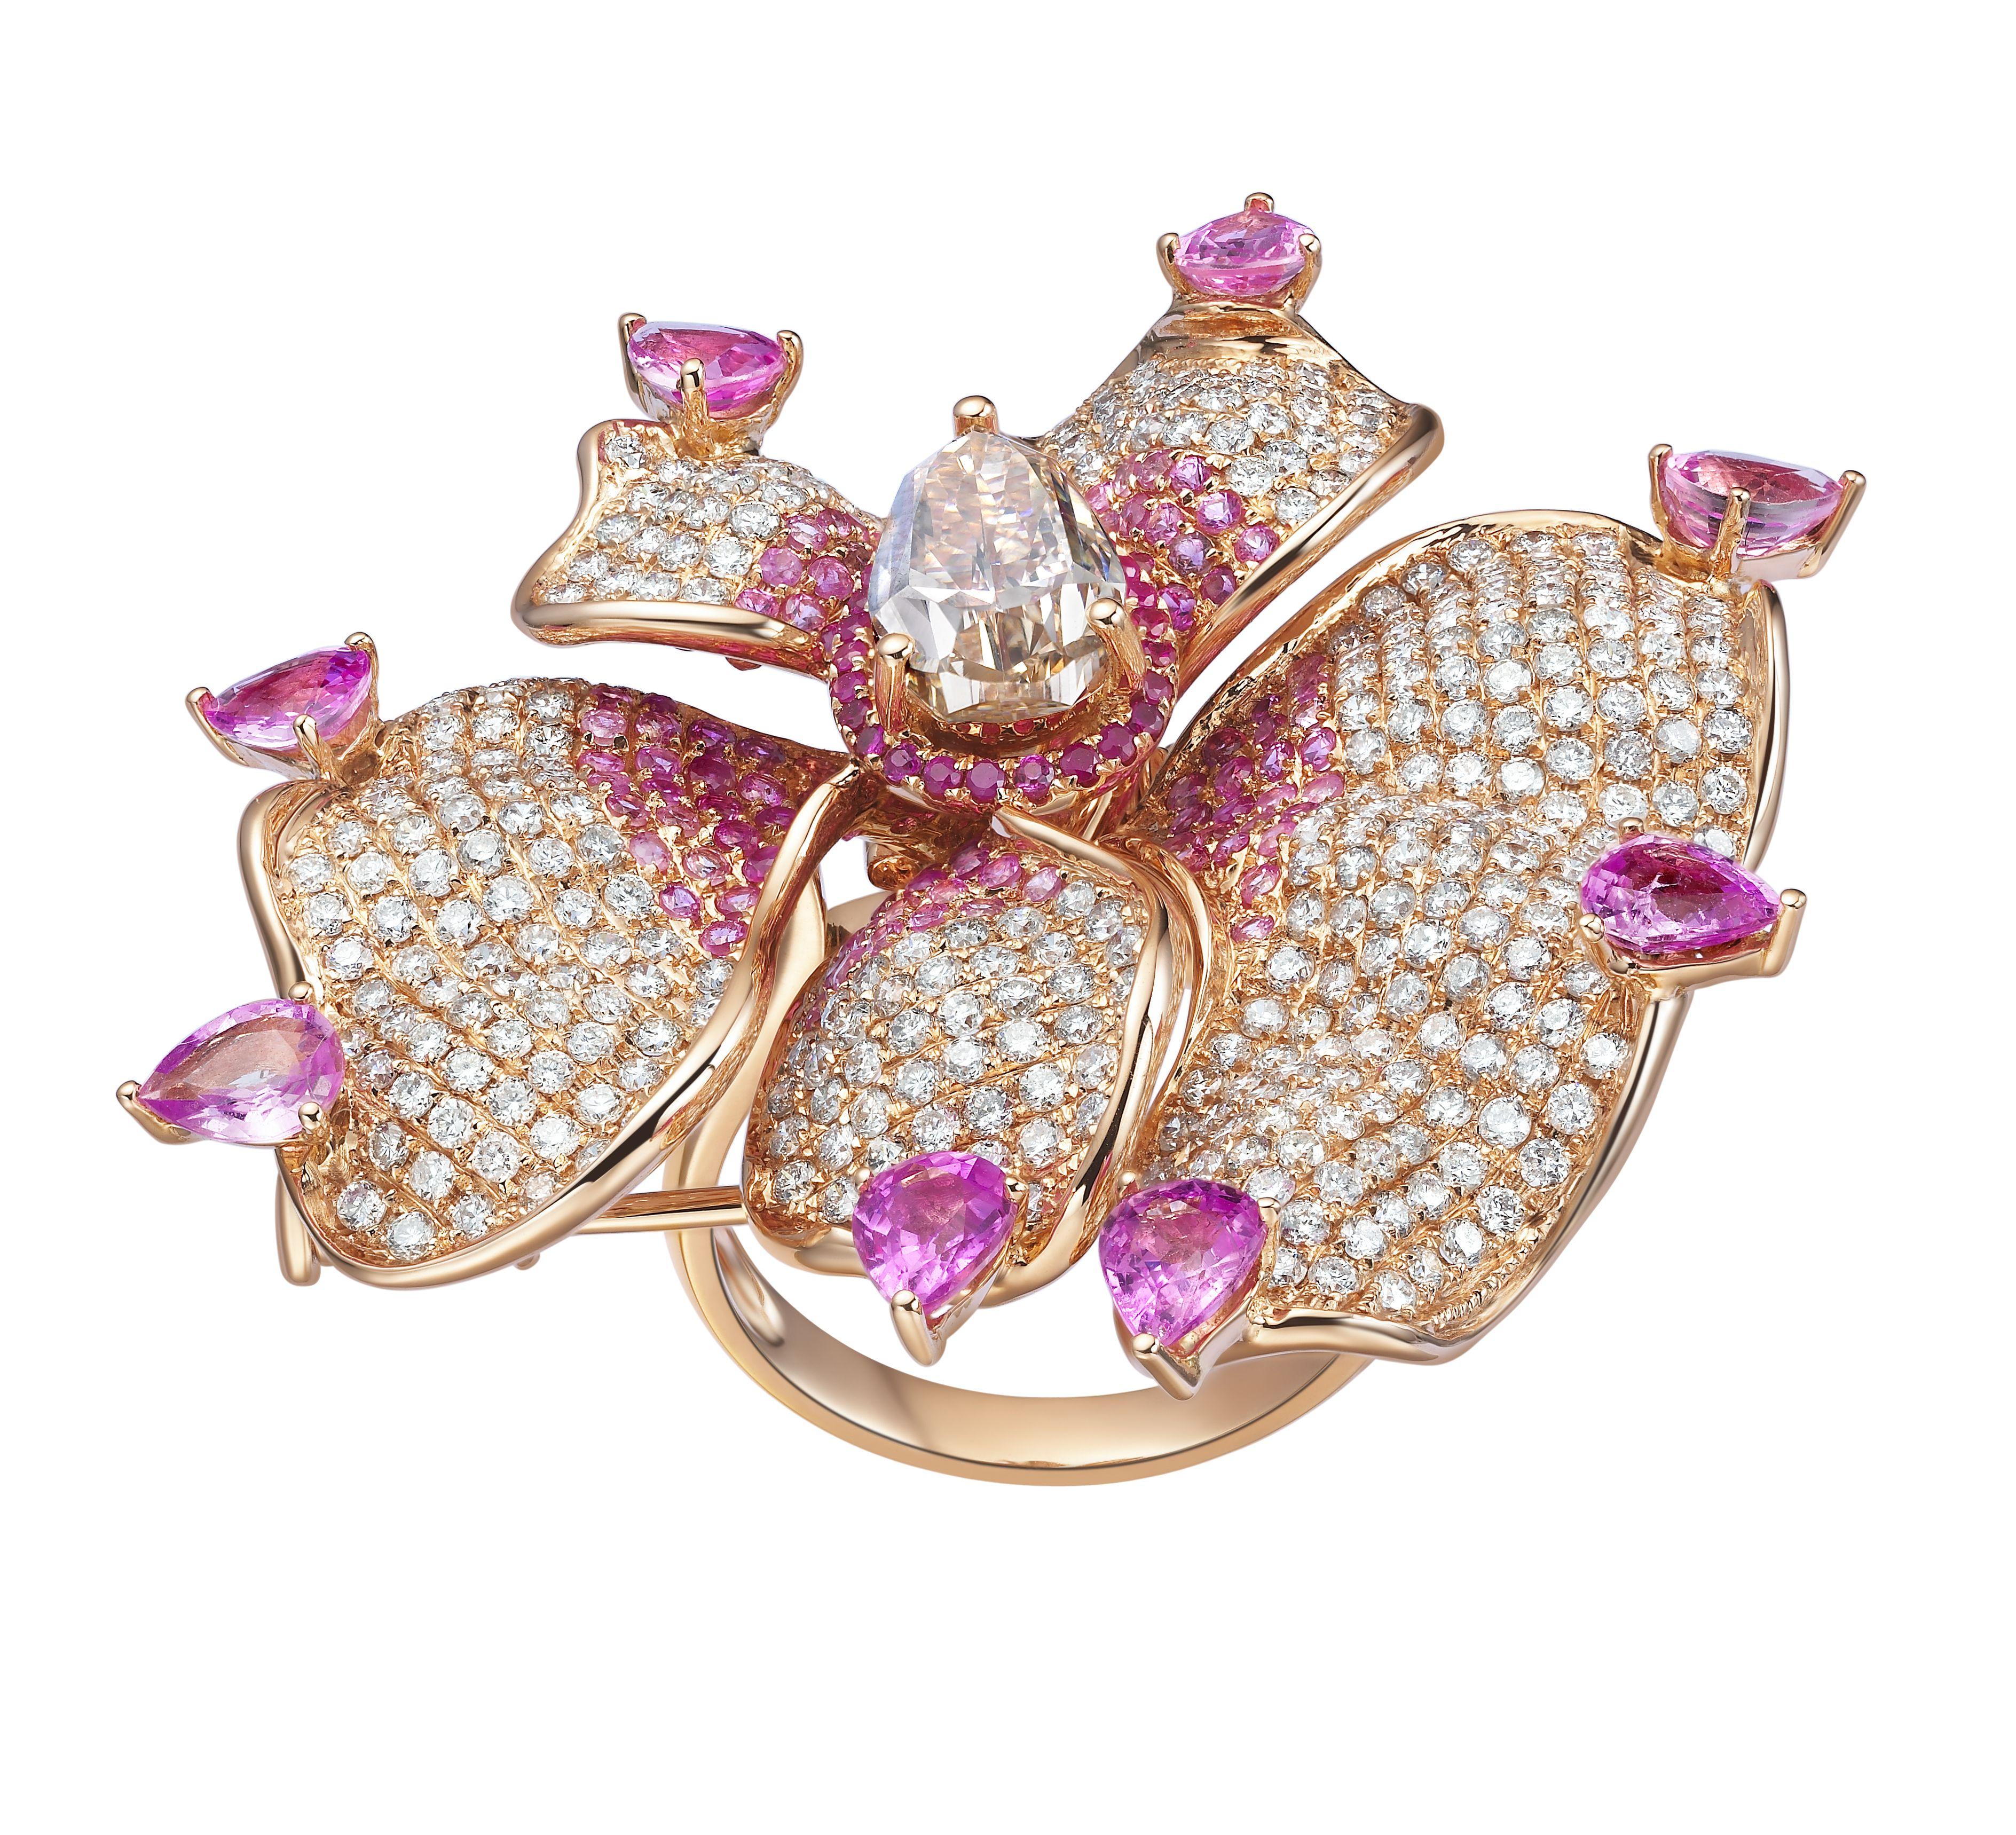 Orchid flower ring & brooch by Fei Liu | Cool Jewelry | Pinterest ...